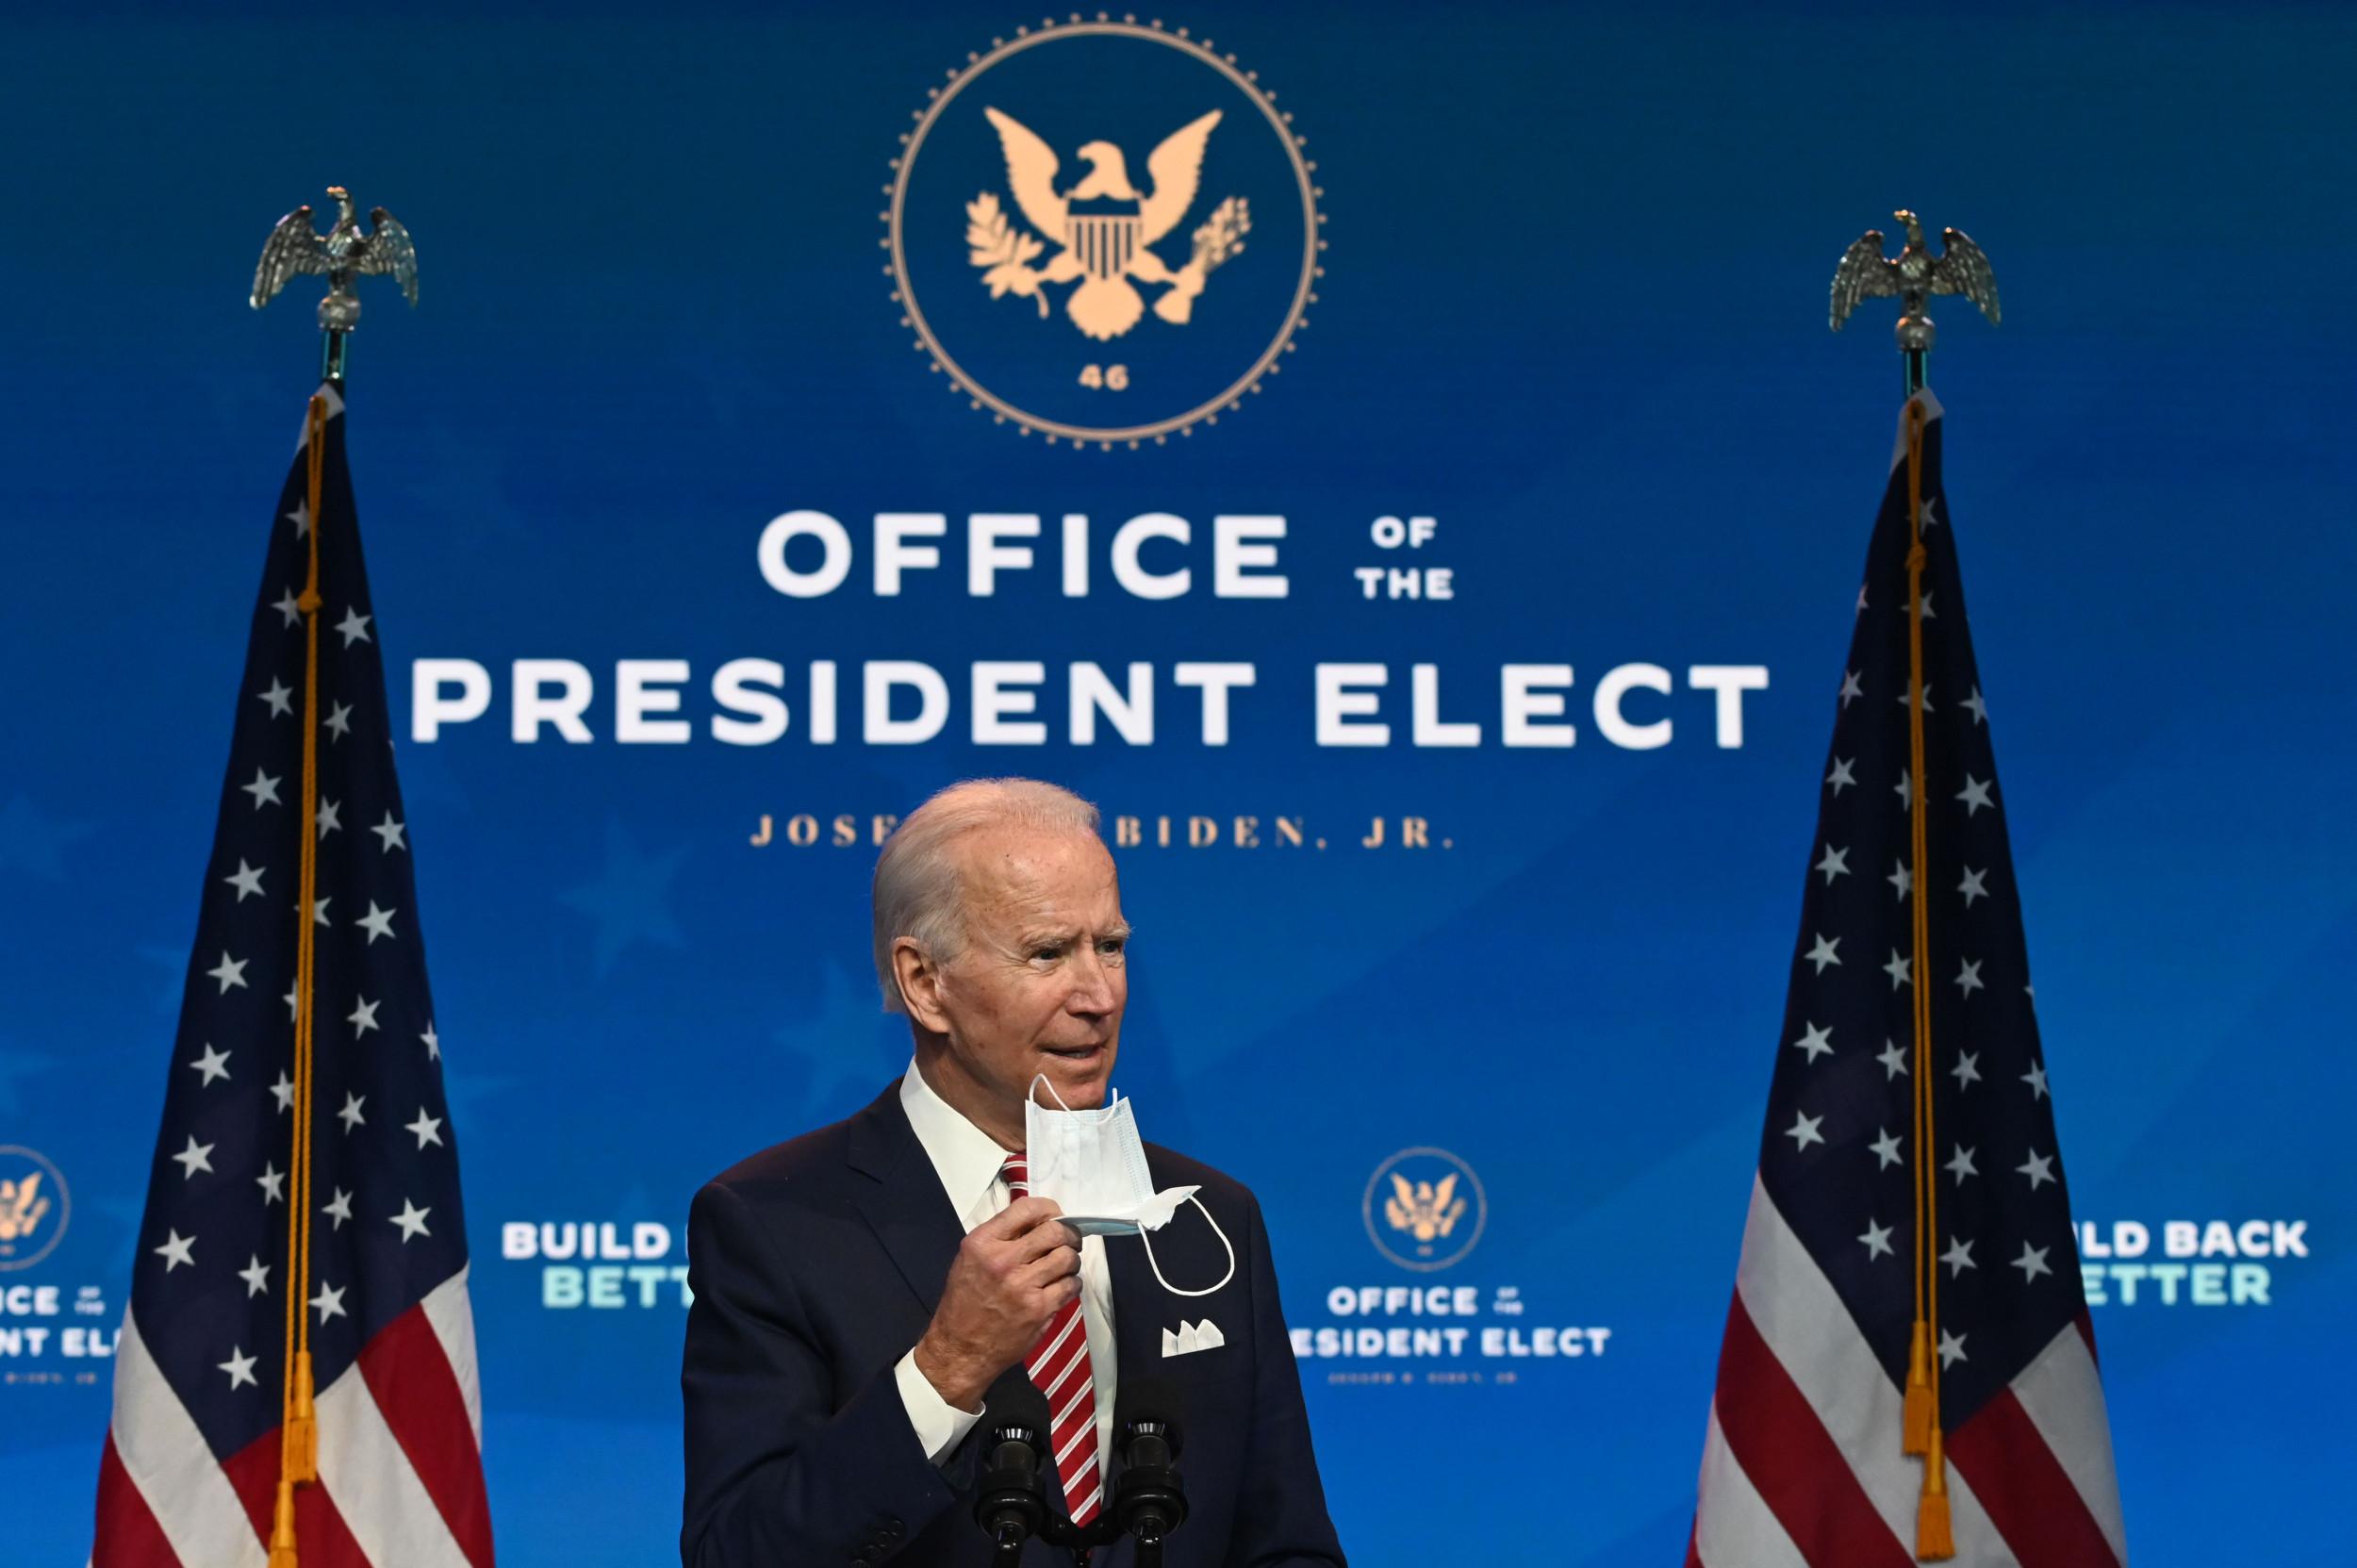 Federal official blocking Biden's transition secretly seeks new job for 2021